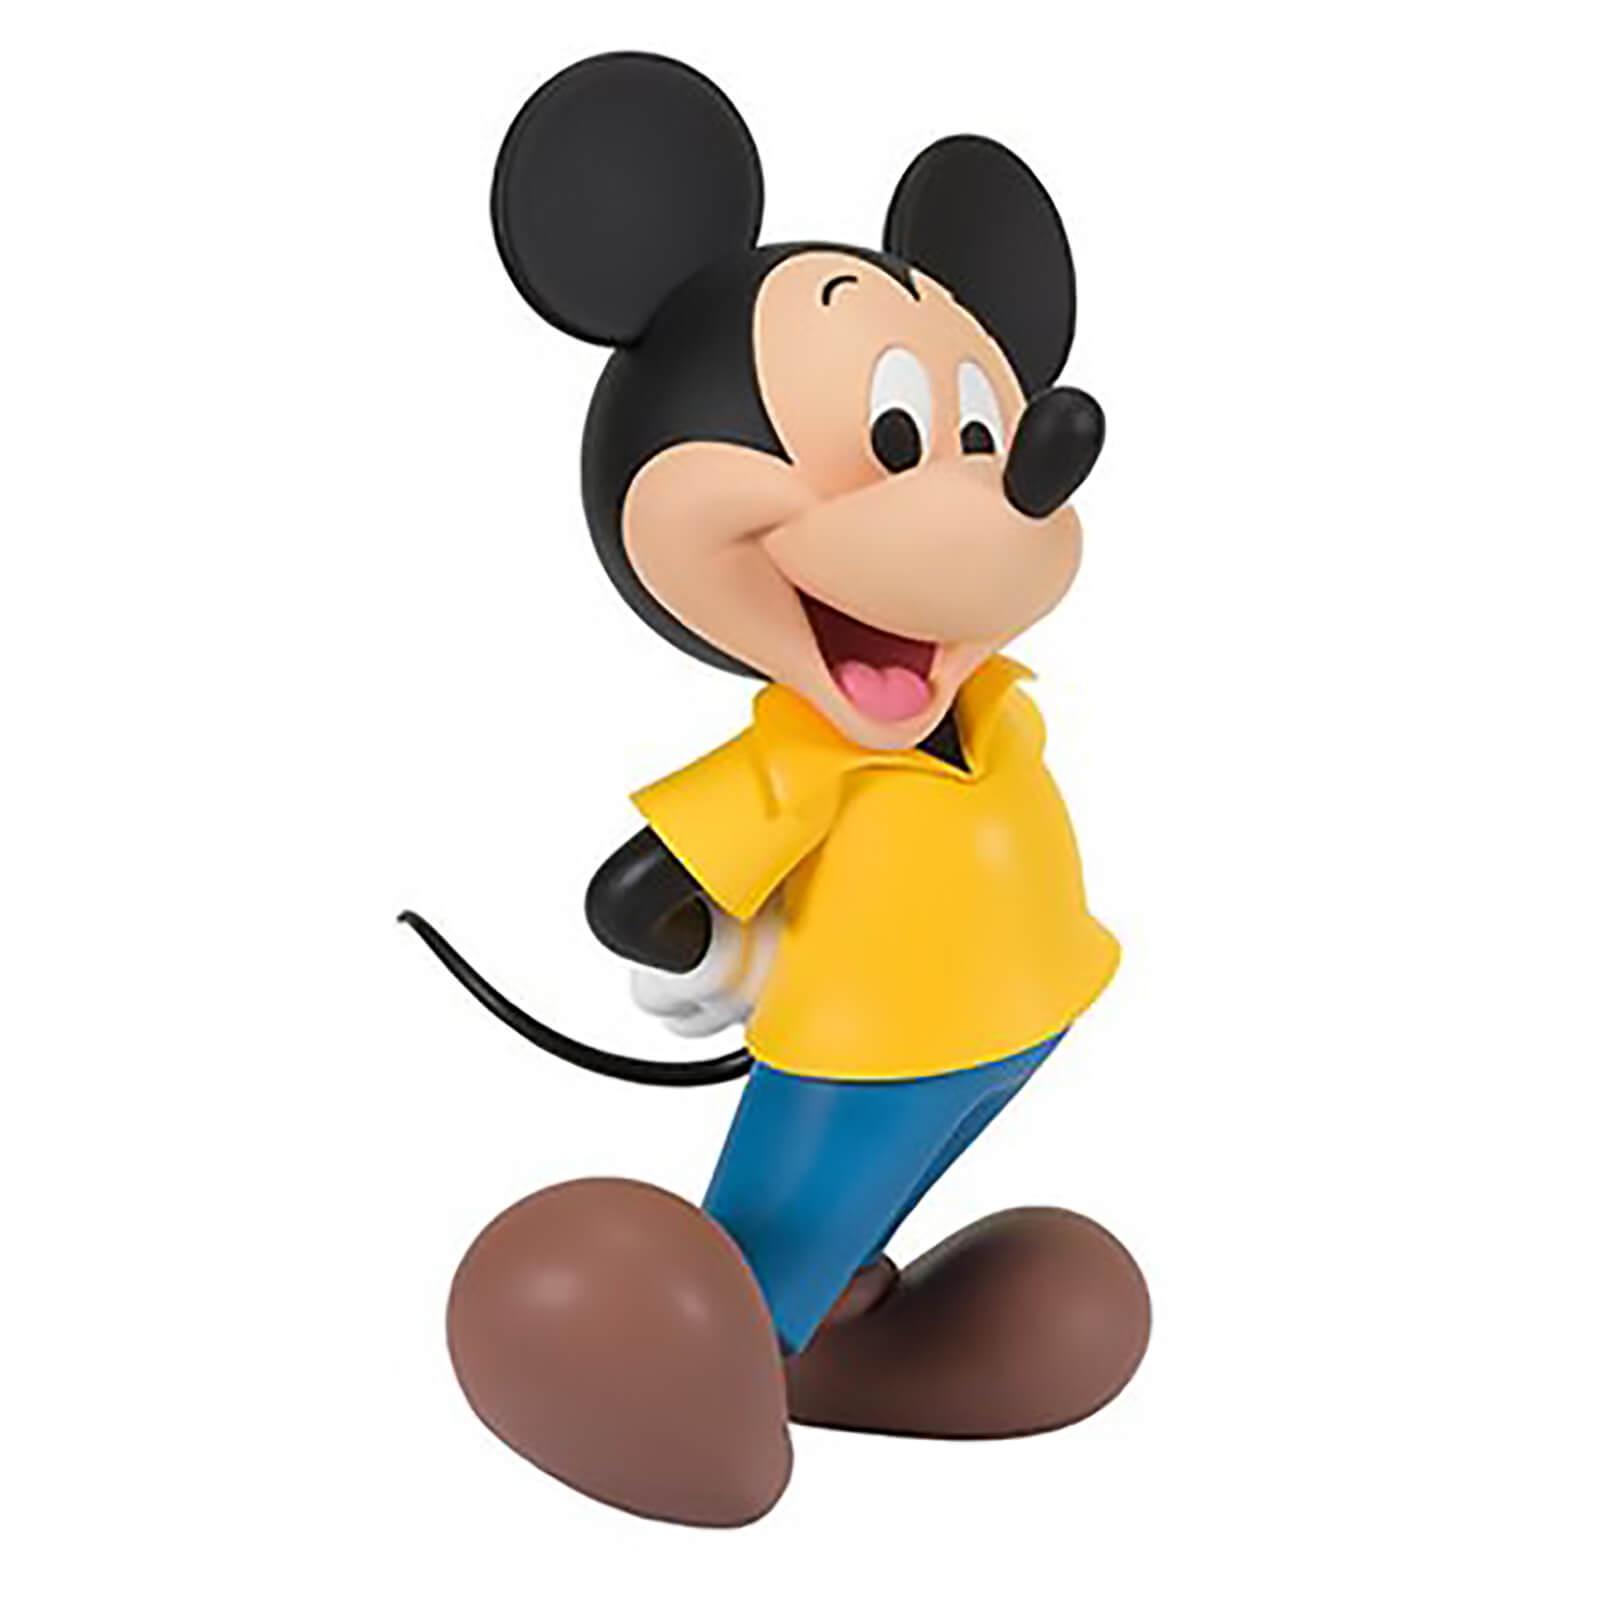 Bandai Tamashii Nations Disney Mickey Mouse 1980s Mickey Figuarts ZERO Statue 13cm-